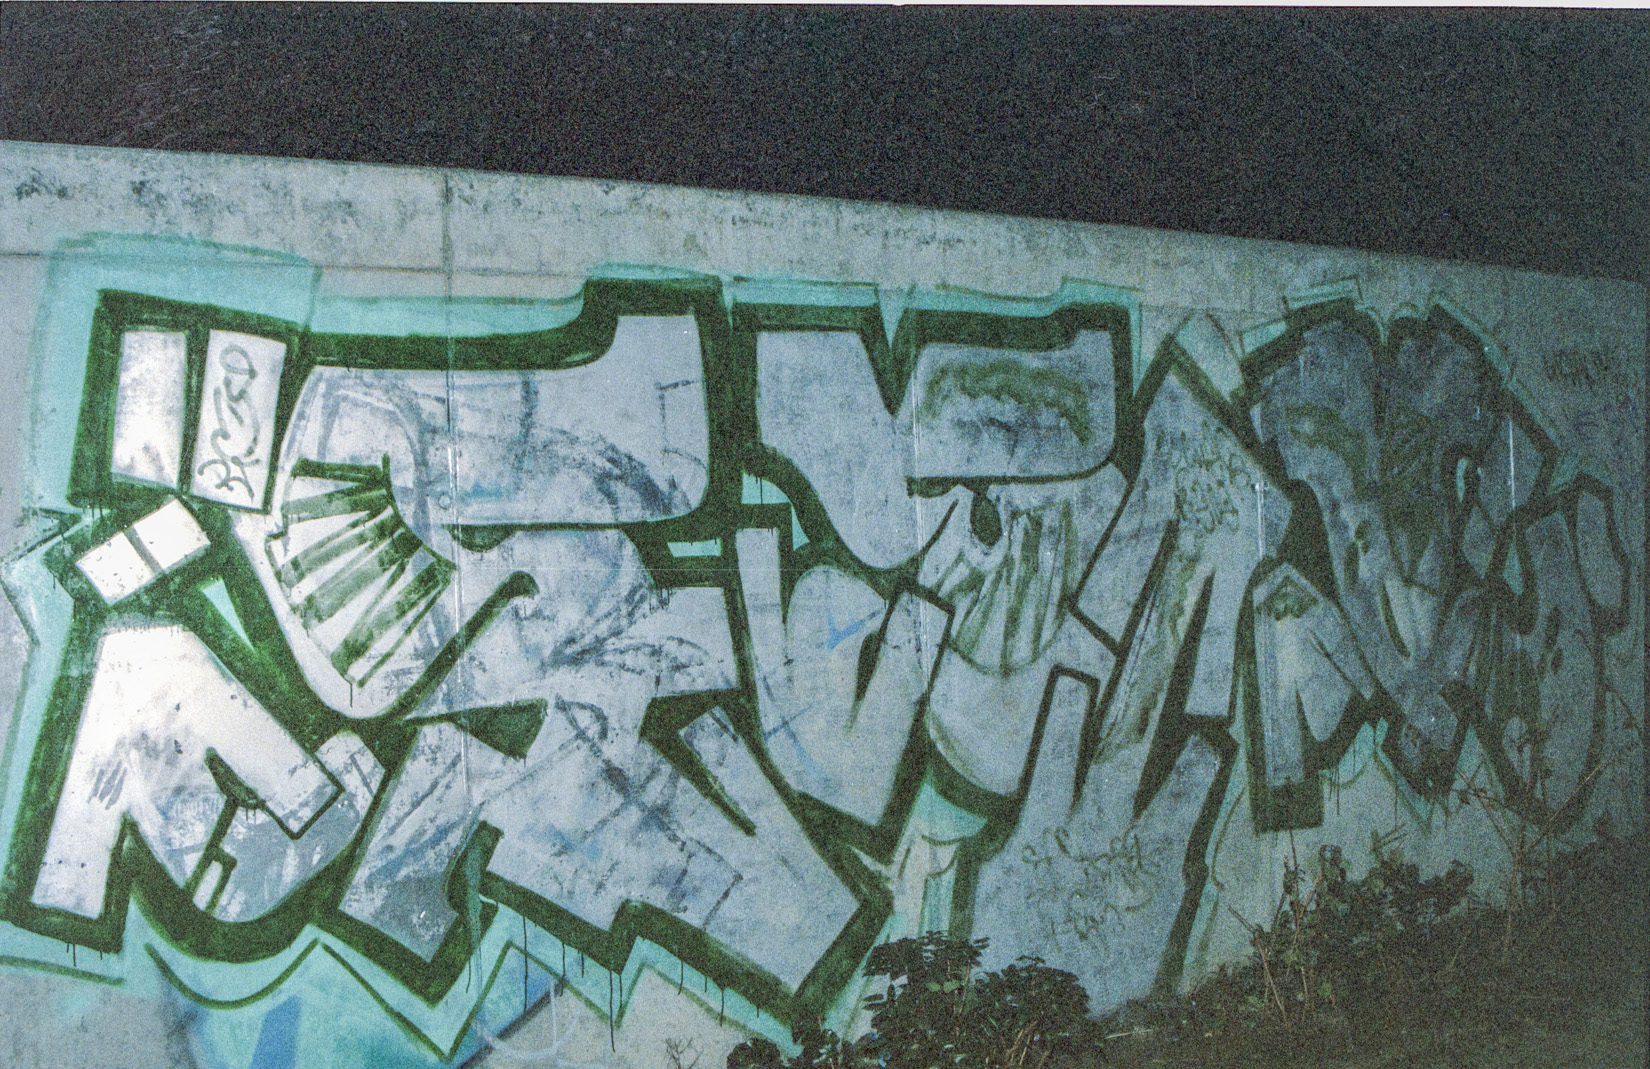 Frankfurt_Graffiti_1988_1989_H88_FRC (24 von 25)